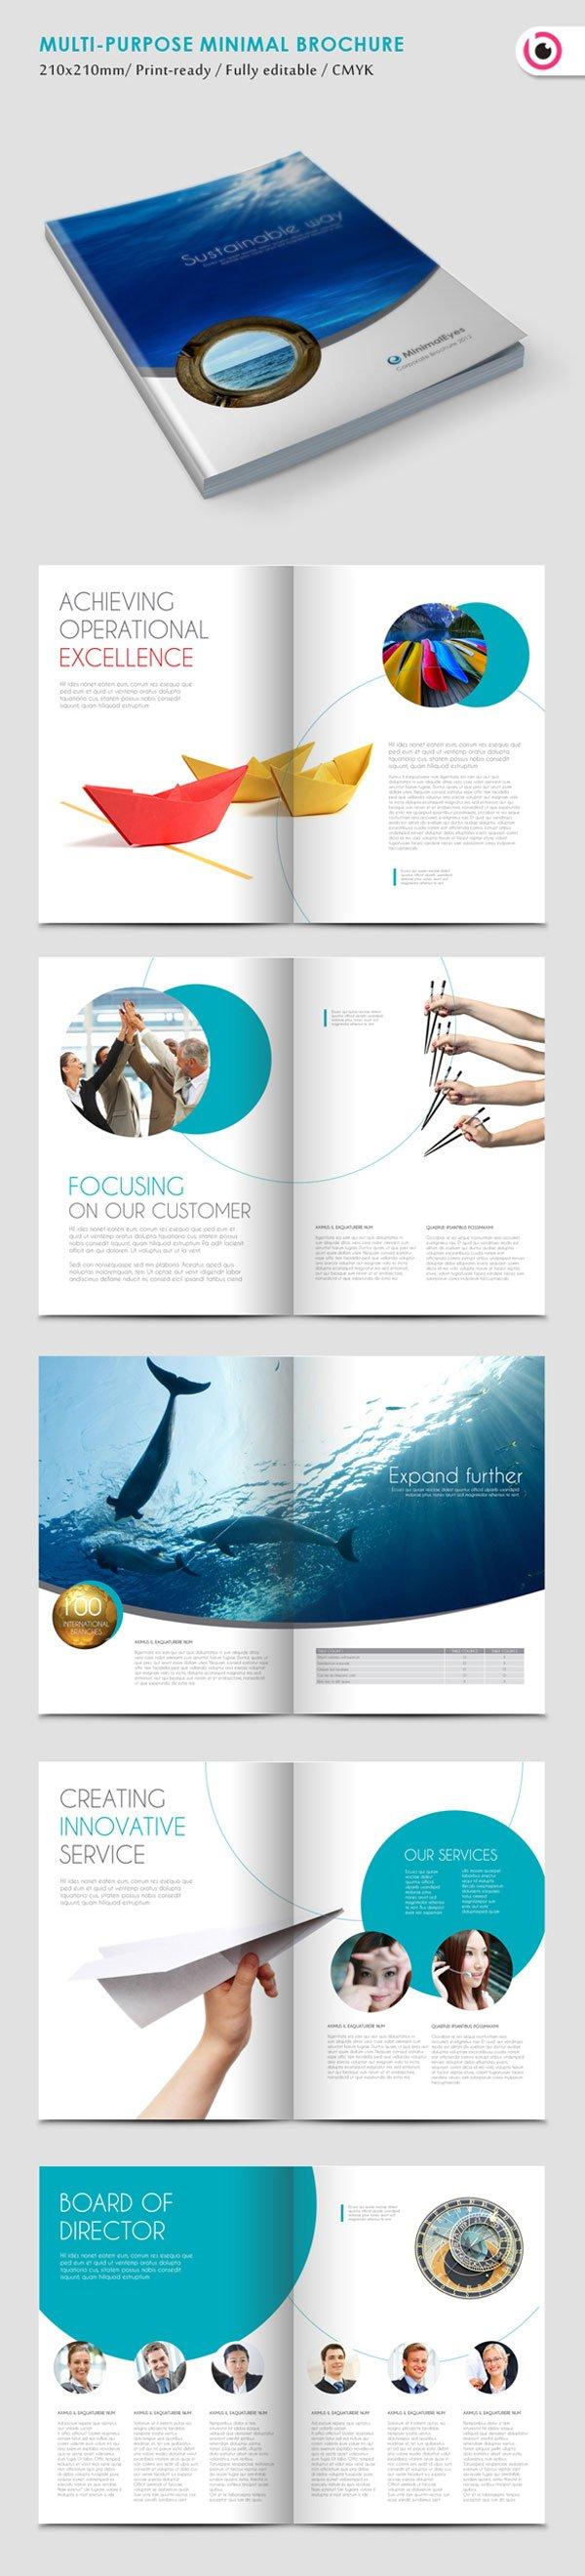 minimal-brochure-design-template